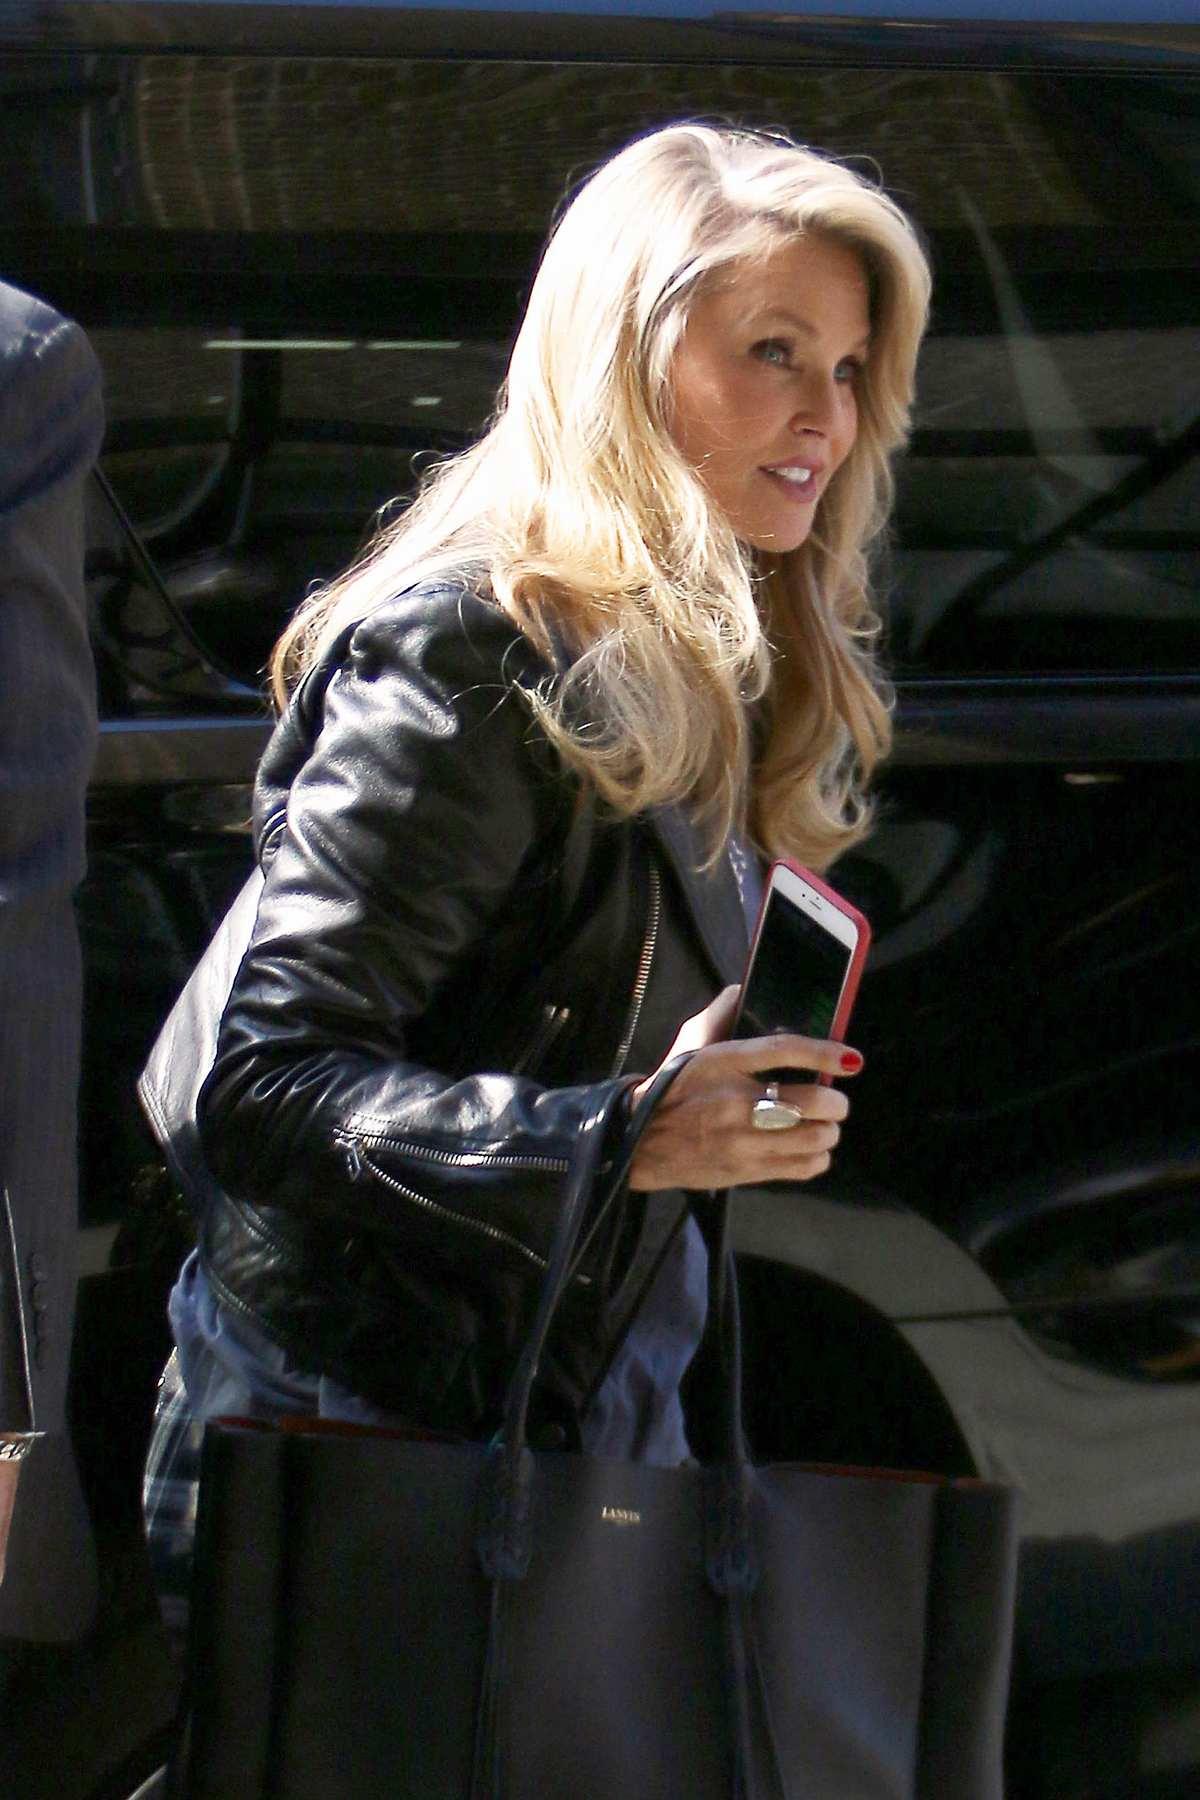 Christie Brinkley and John Mellencamp Leaving Greenwich Hotel-3